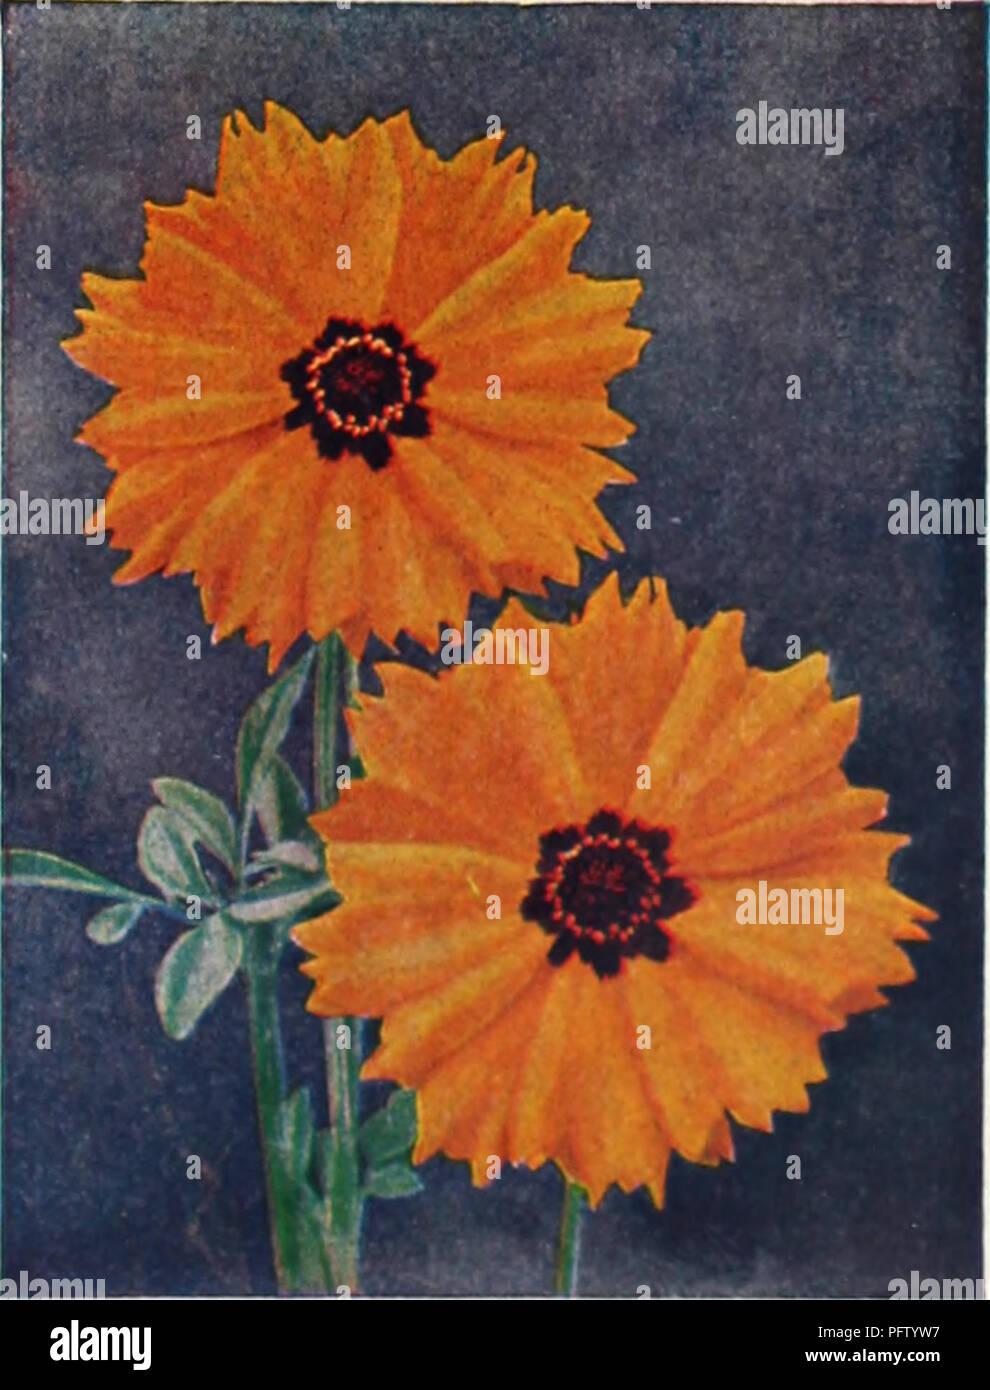 Curries 65th Year Garden Annual Flowers Seeds Catalogs Bulbs